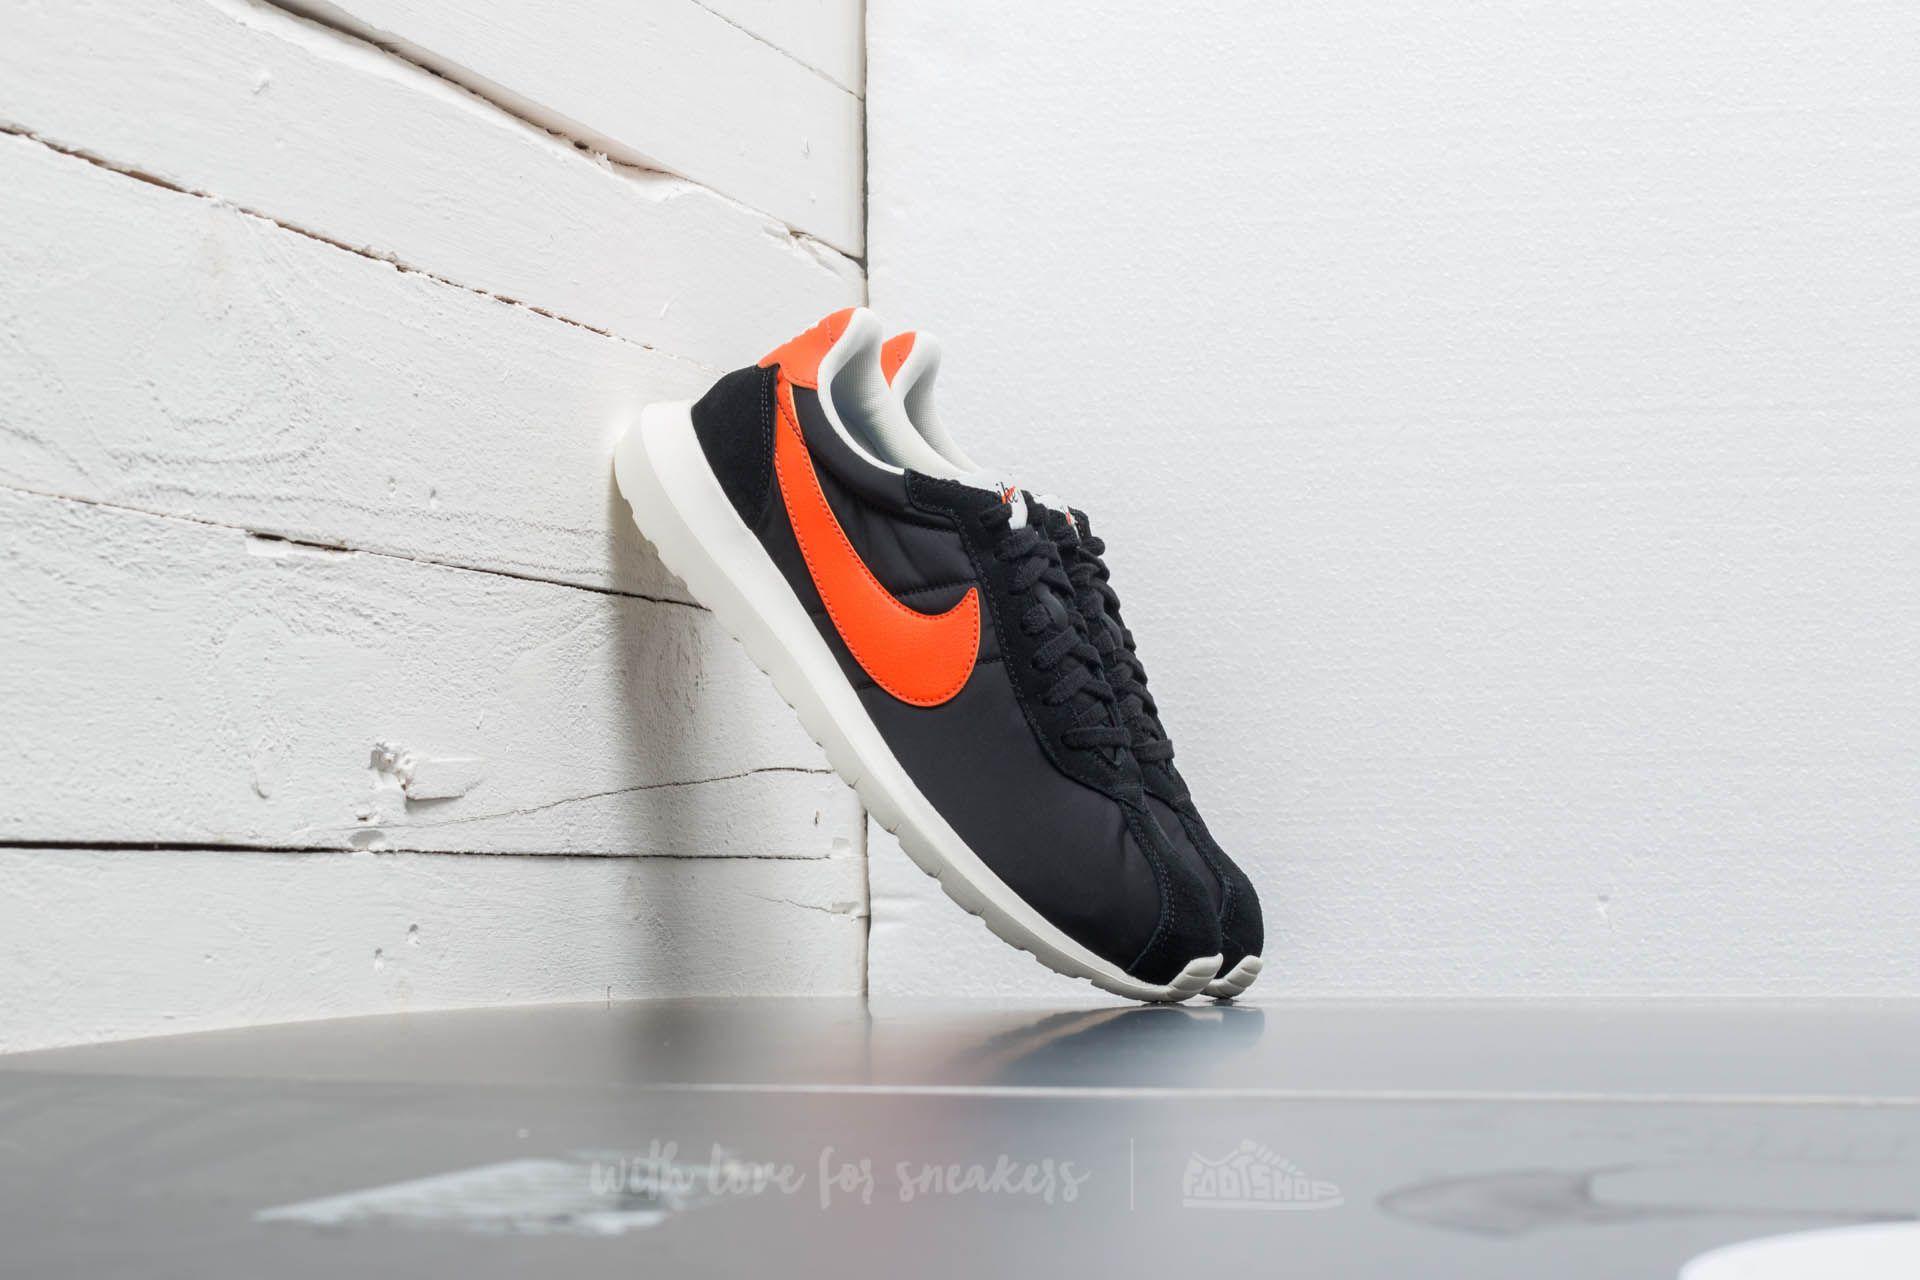 black nike shoes with orange swoosh